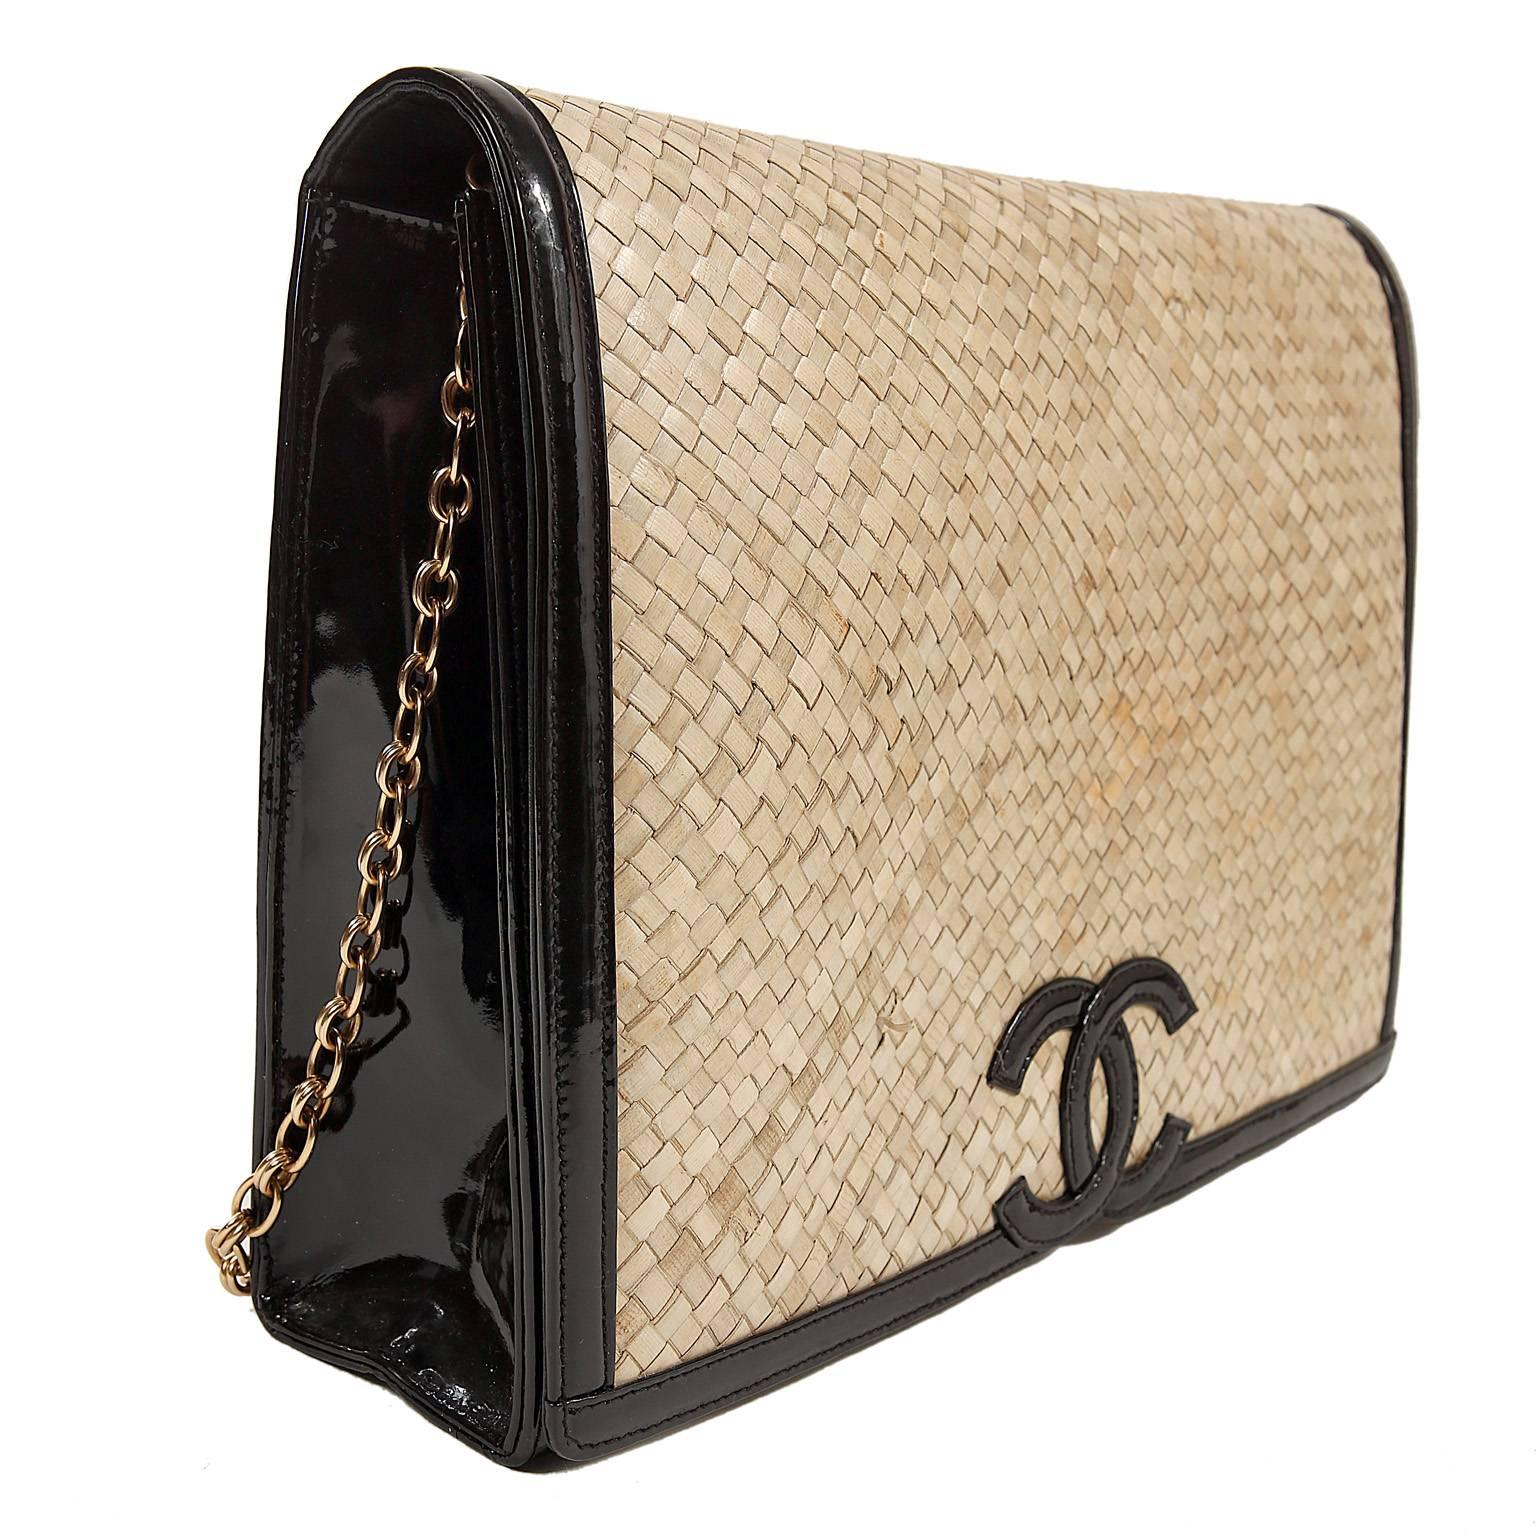 b4035f829b0fd4 Chanel Raffia Woven Flap Bag by Amen Wardy at 1stdibs